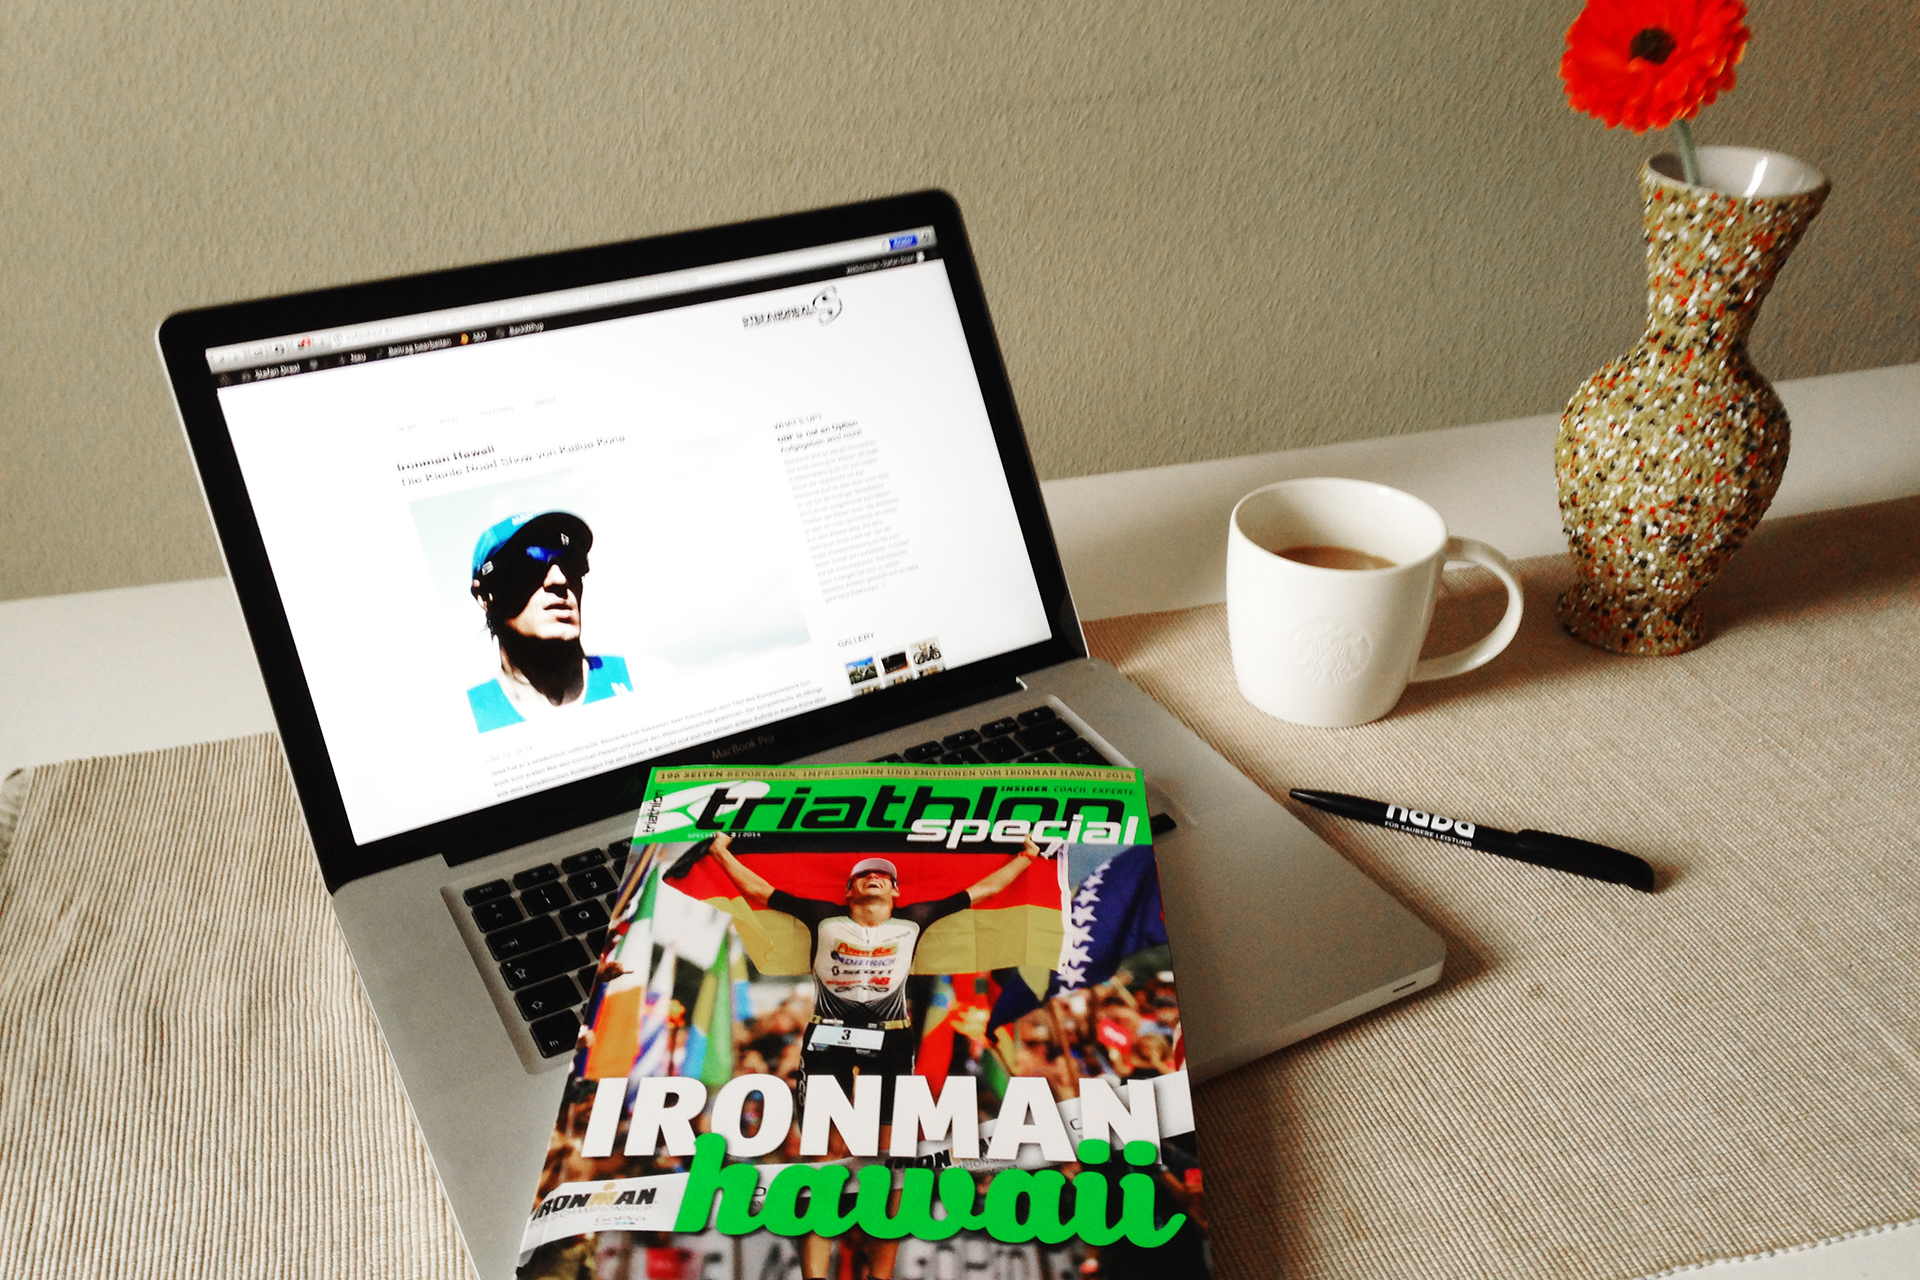 Triathlon special 2/2014: Ironman Hawaii jetzt im Handel